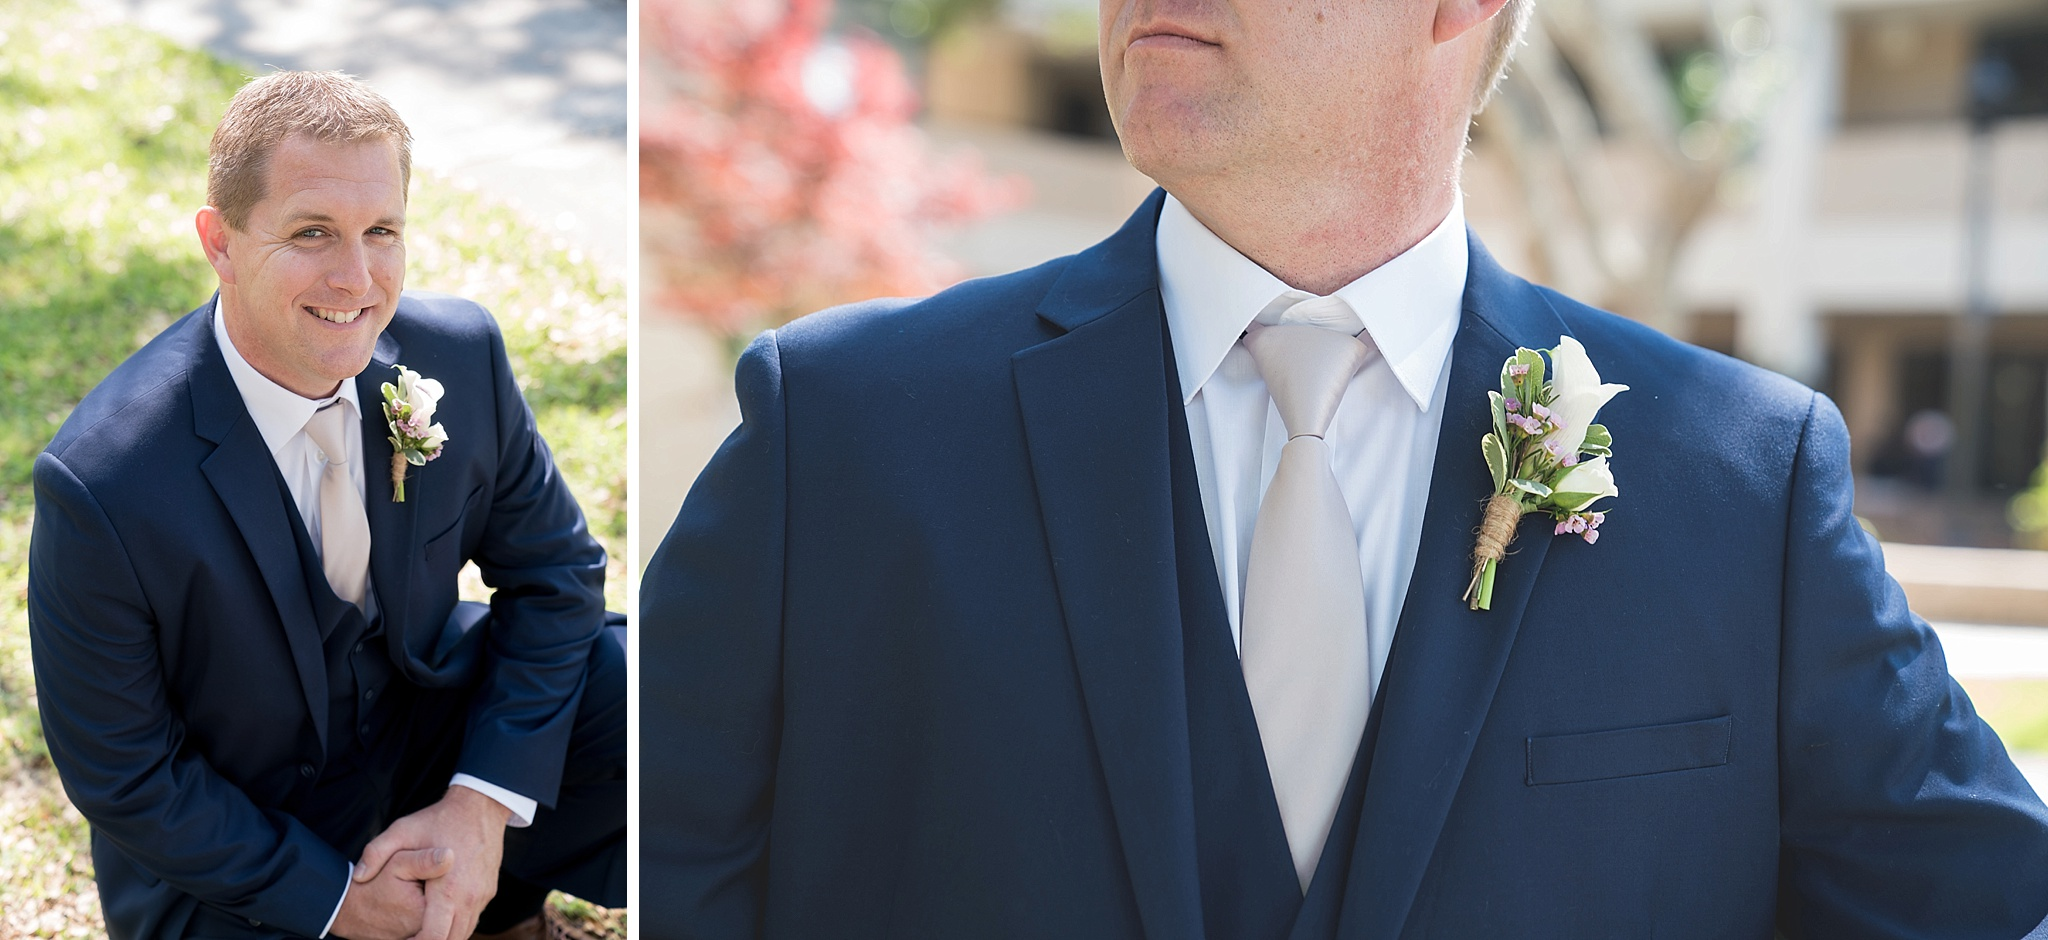 Crystal-Coast-Wedding-Photographer-016.jpg